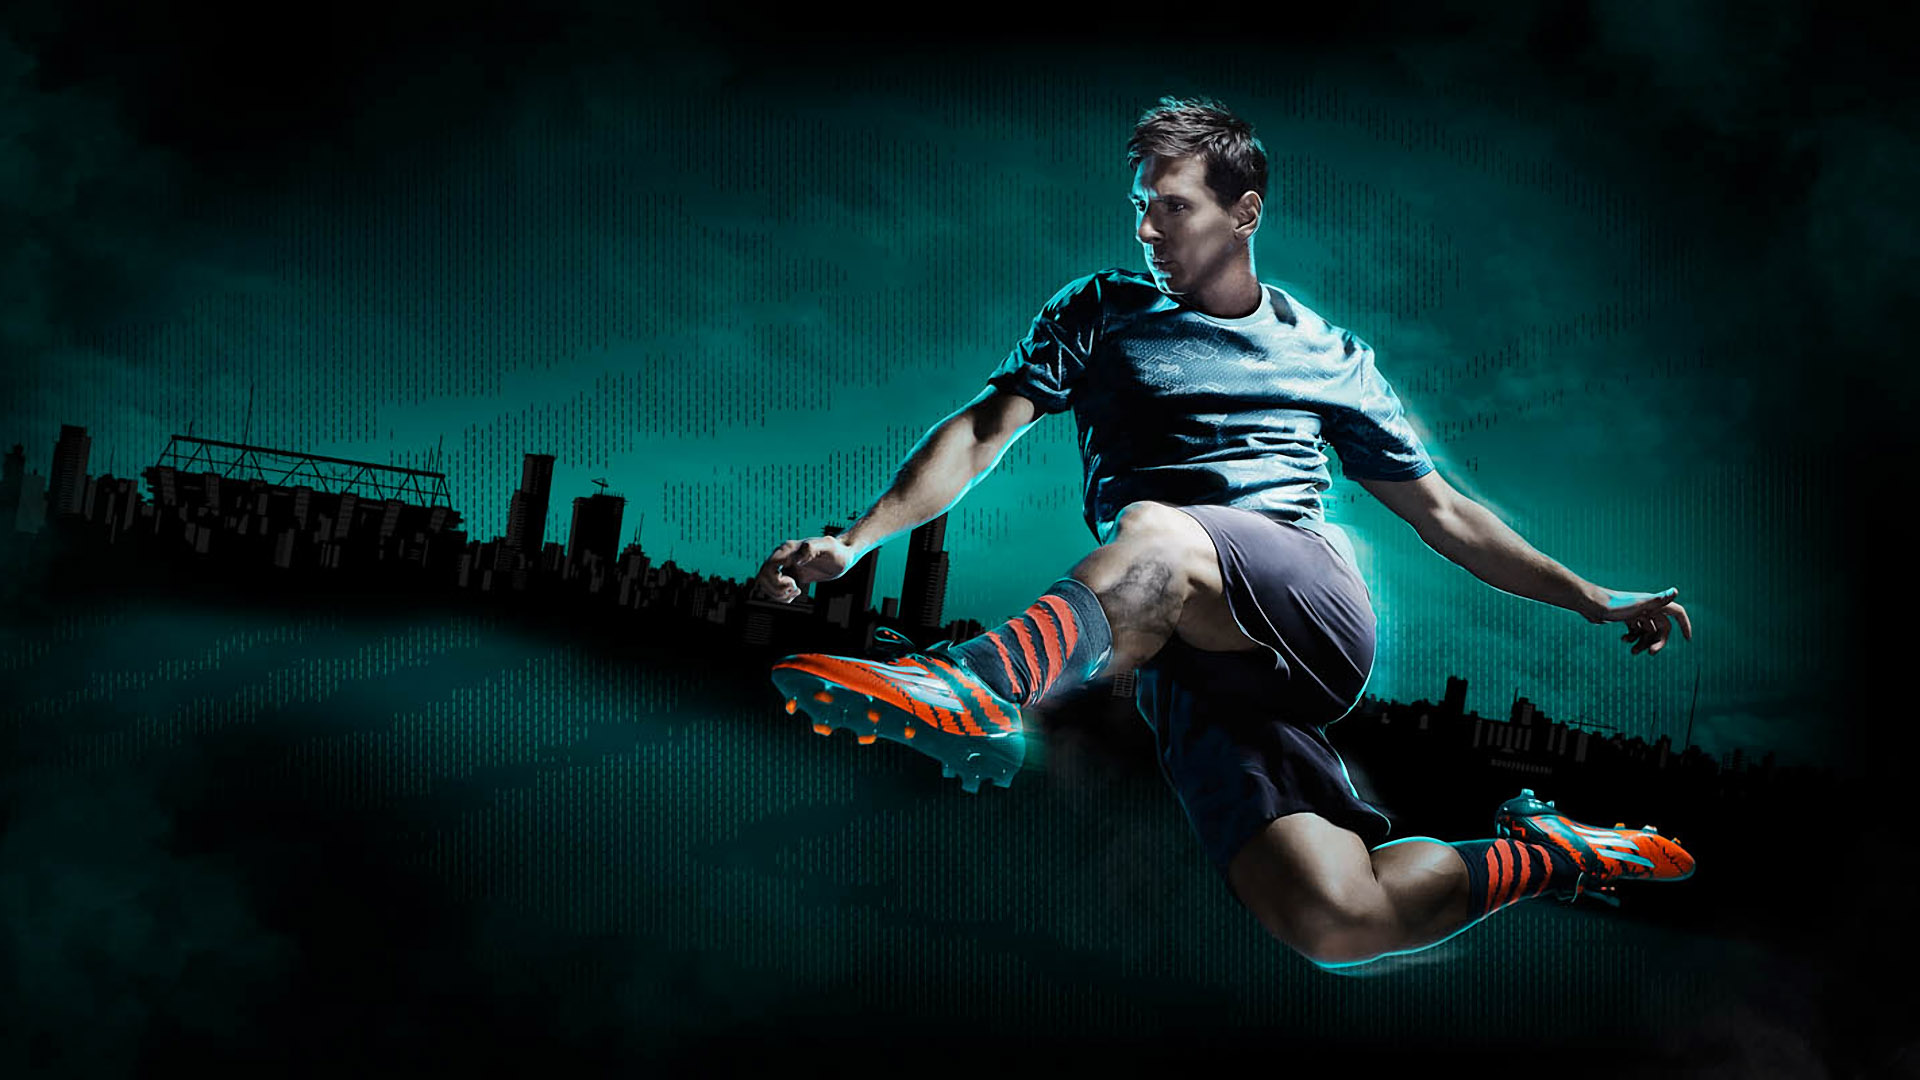 Adidas Football Wallpaper 2015 5 1920x1080